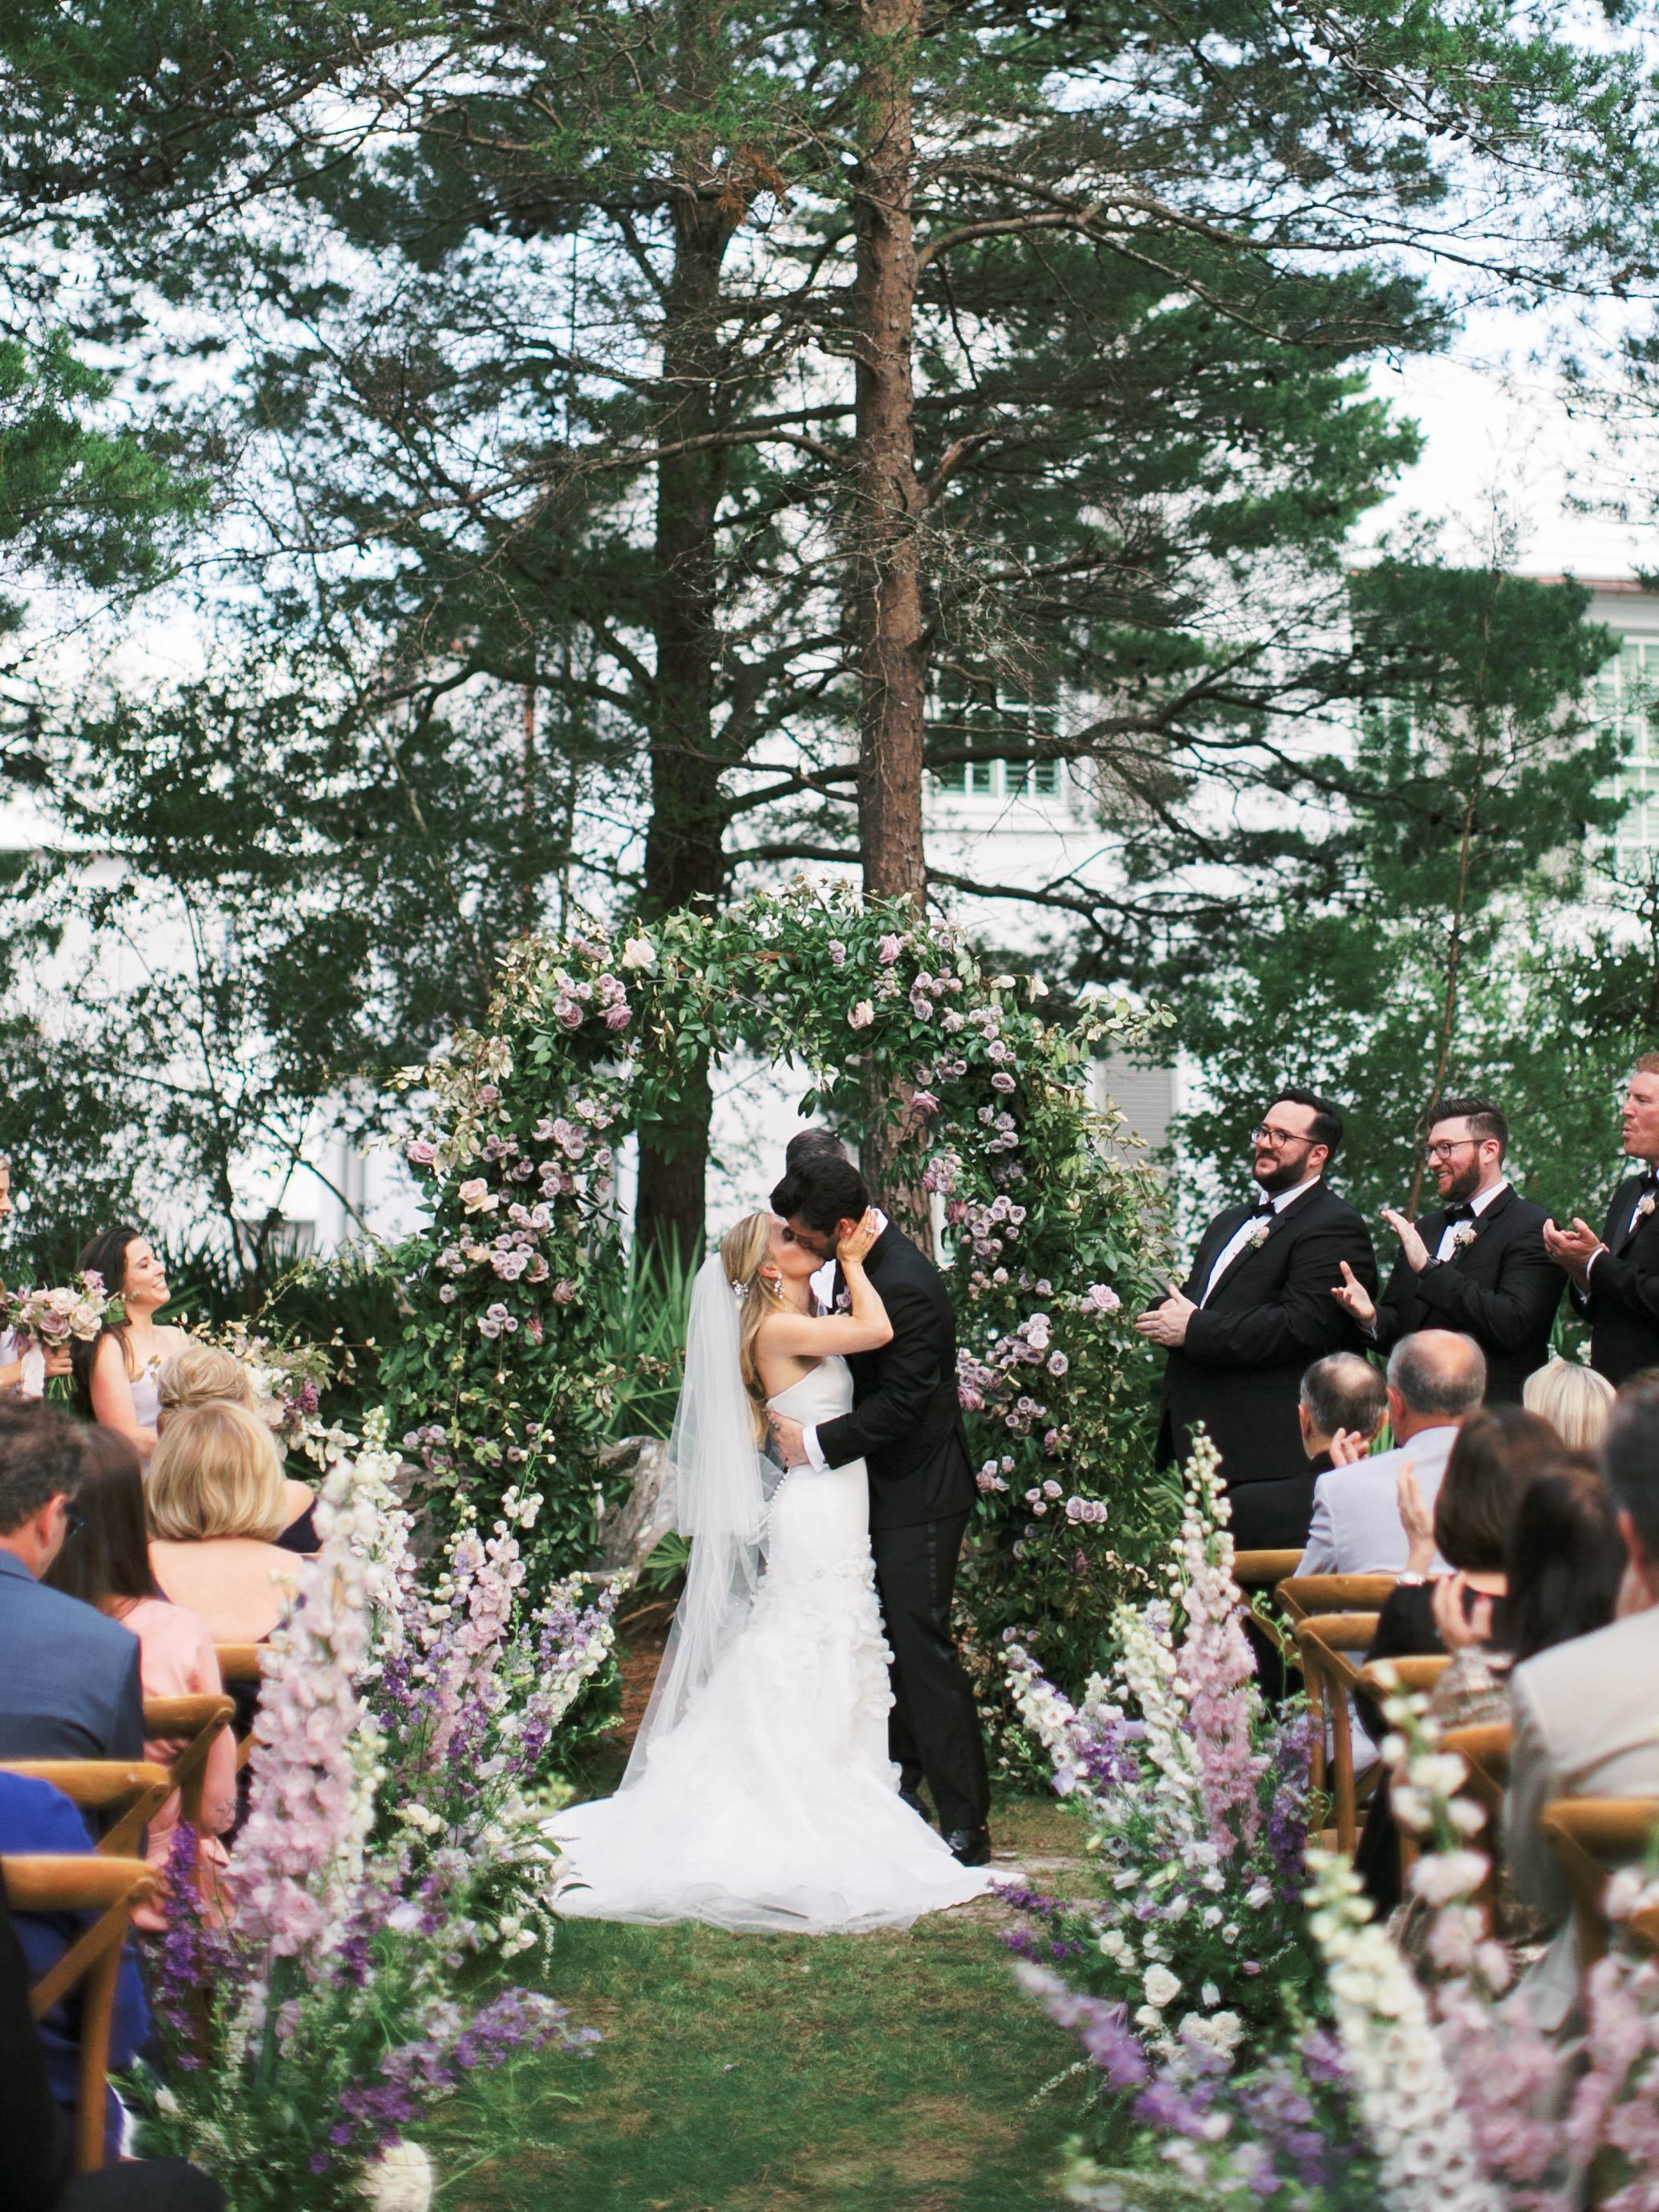 leighton craig wedding ceremony kiss